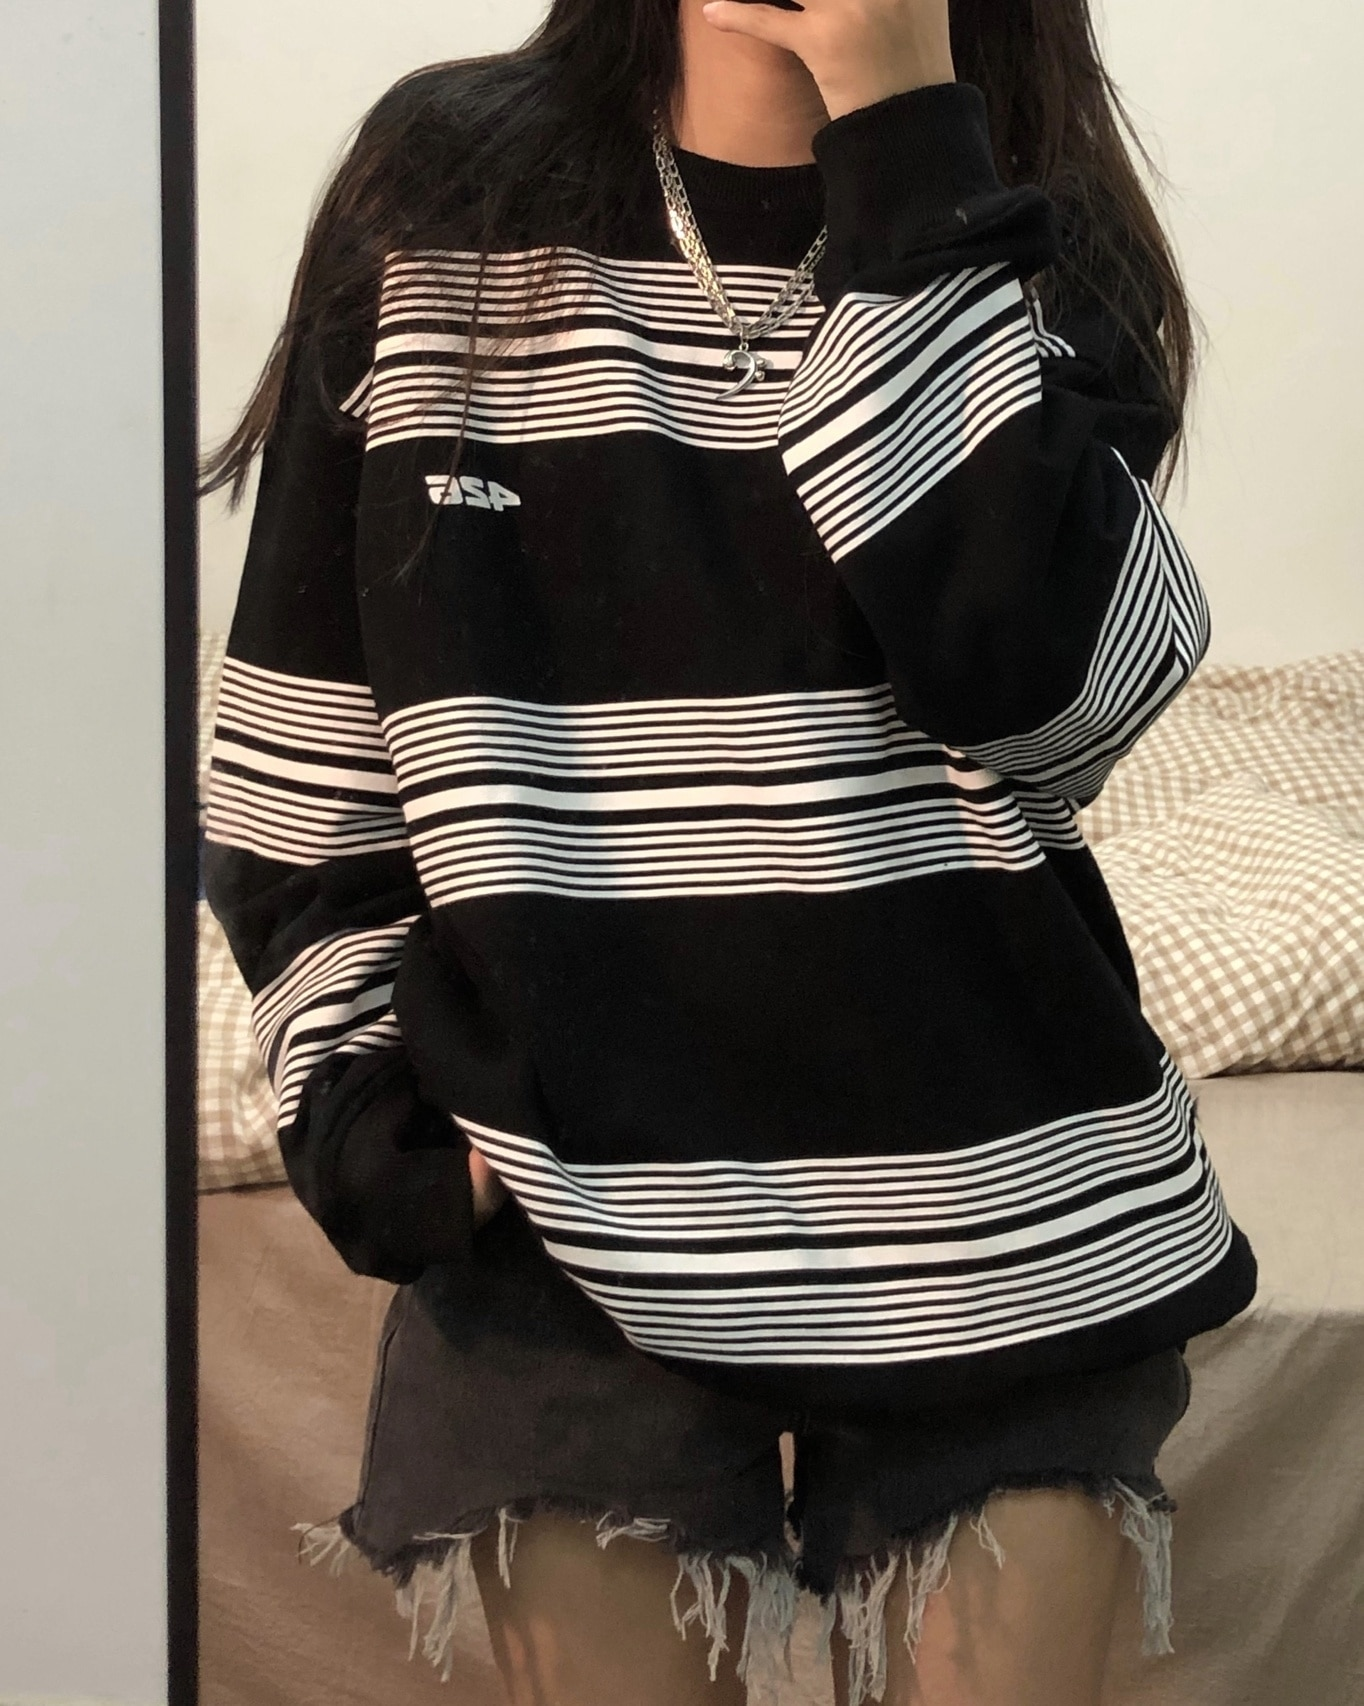 Hoodies Women's Sweater Autumn 2021 New Stripe Tide Harajuku Korean Loose Thin Black Long Sleeve Top